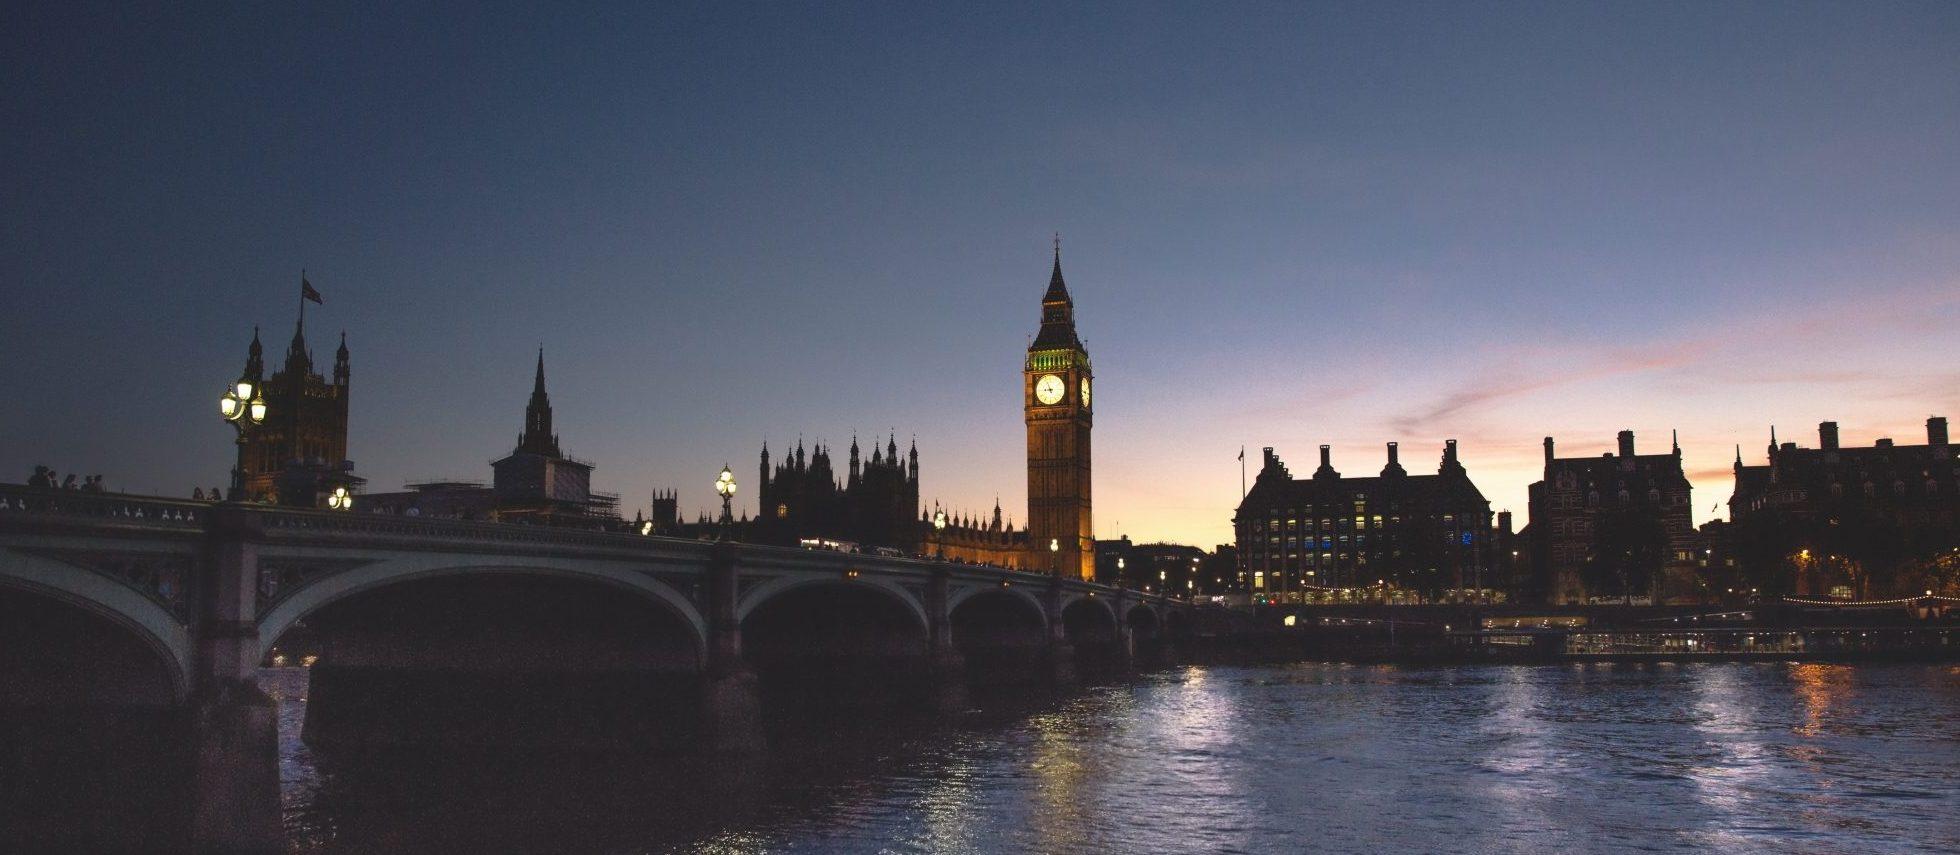 Digital Government 2014